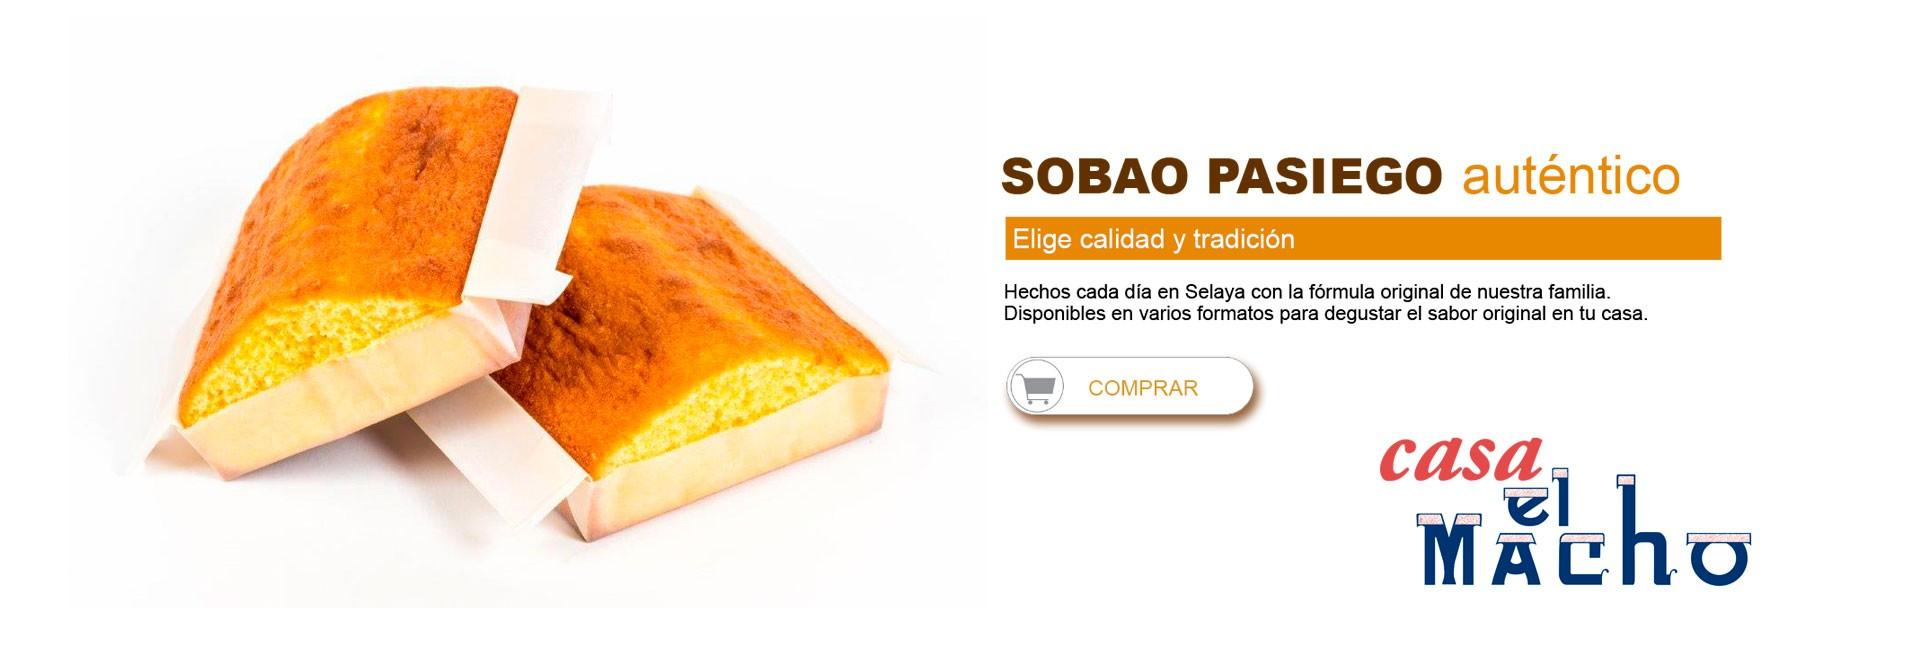 Sobaos Pasiegos de Cantabria